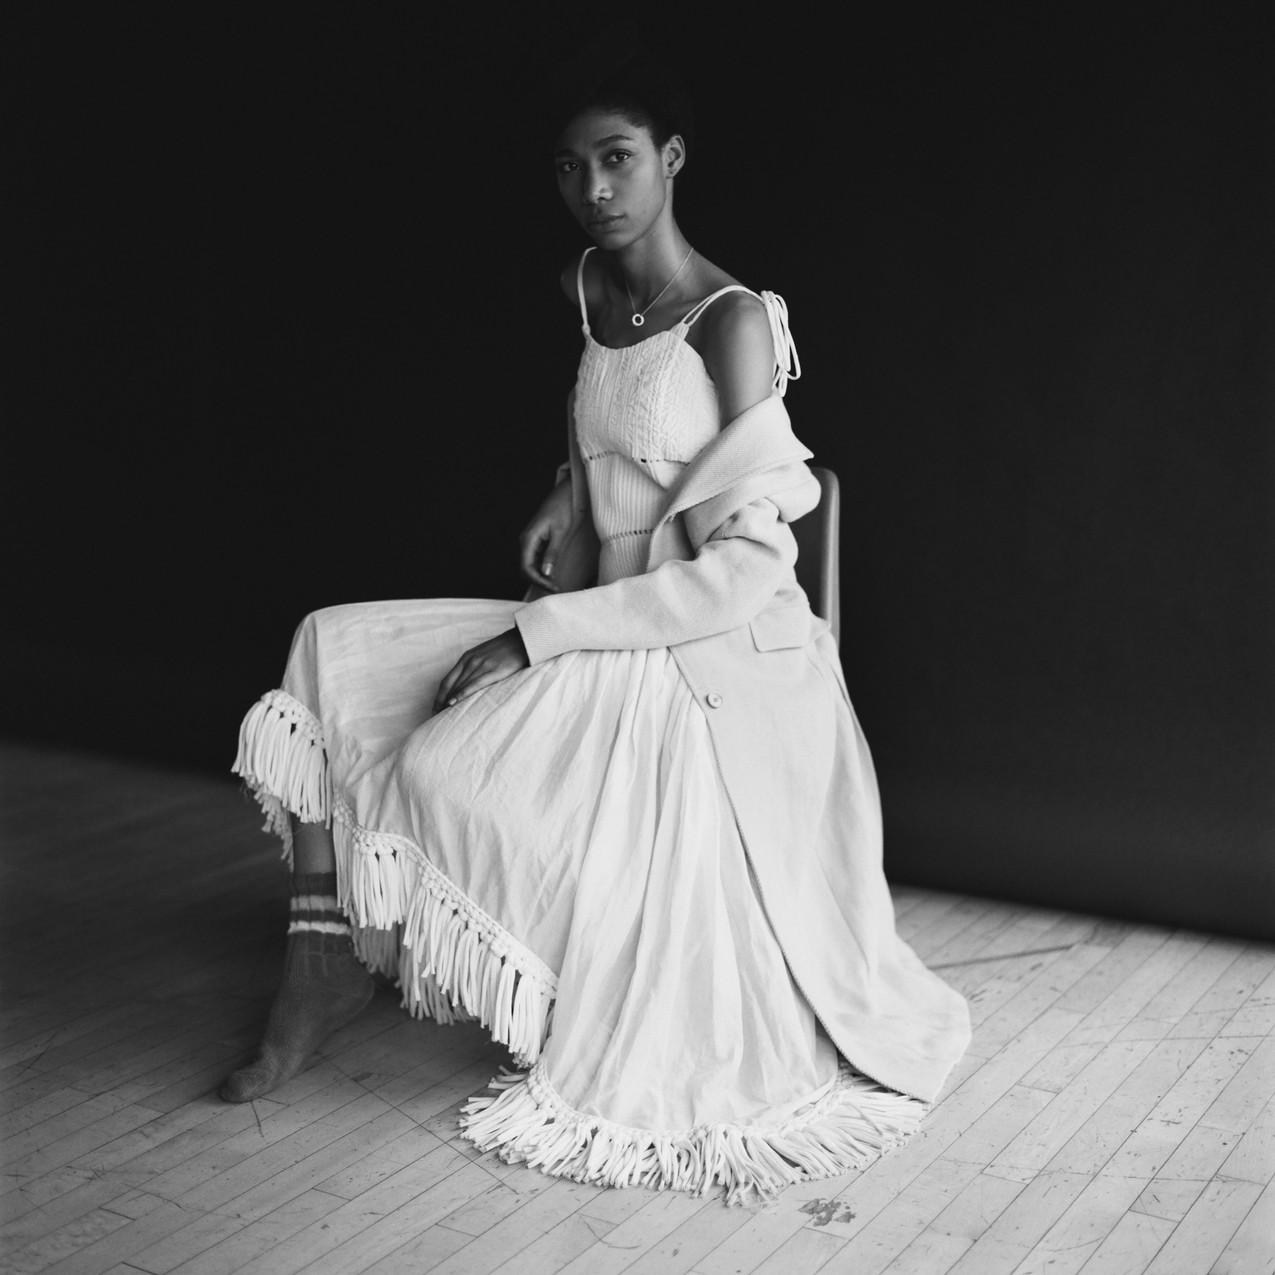 Model Yiara Paola